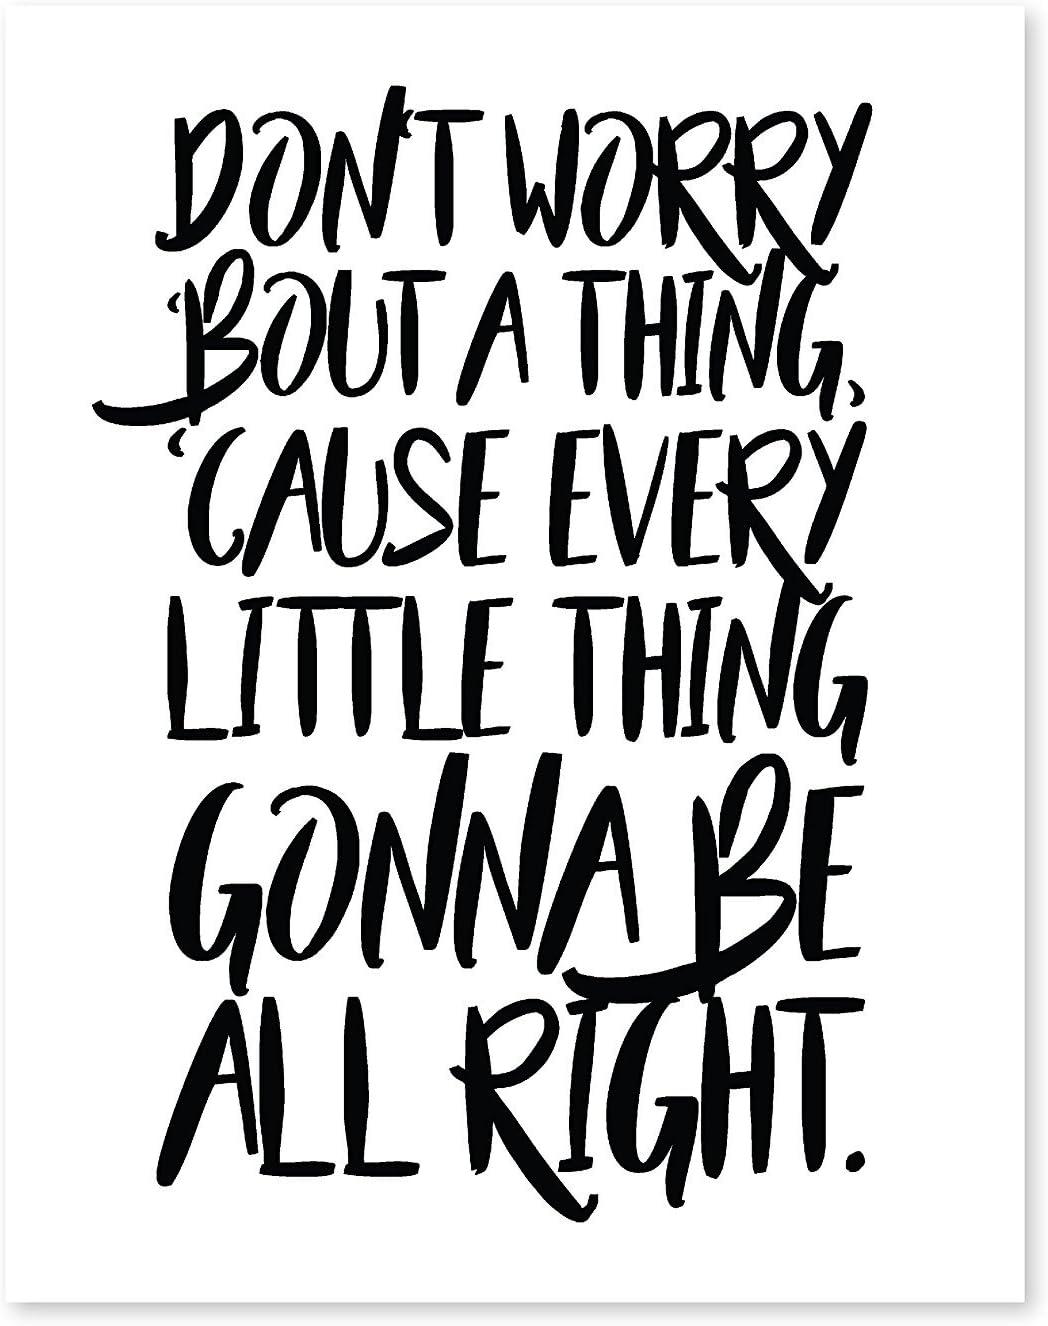 Don't Worry Bout a Thing, 08x10 Inch Print, Motivational Print, Don't Worry Bob Marley, Typography Art, Bob Marley Lyrics, Three Little Birds Lyrics, Bob Marley Song, Don't Worry, Positive Quotes